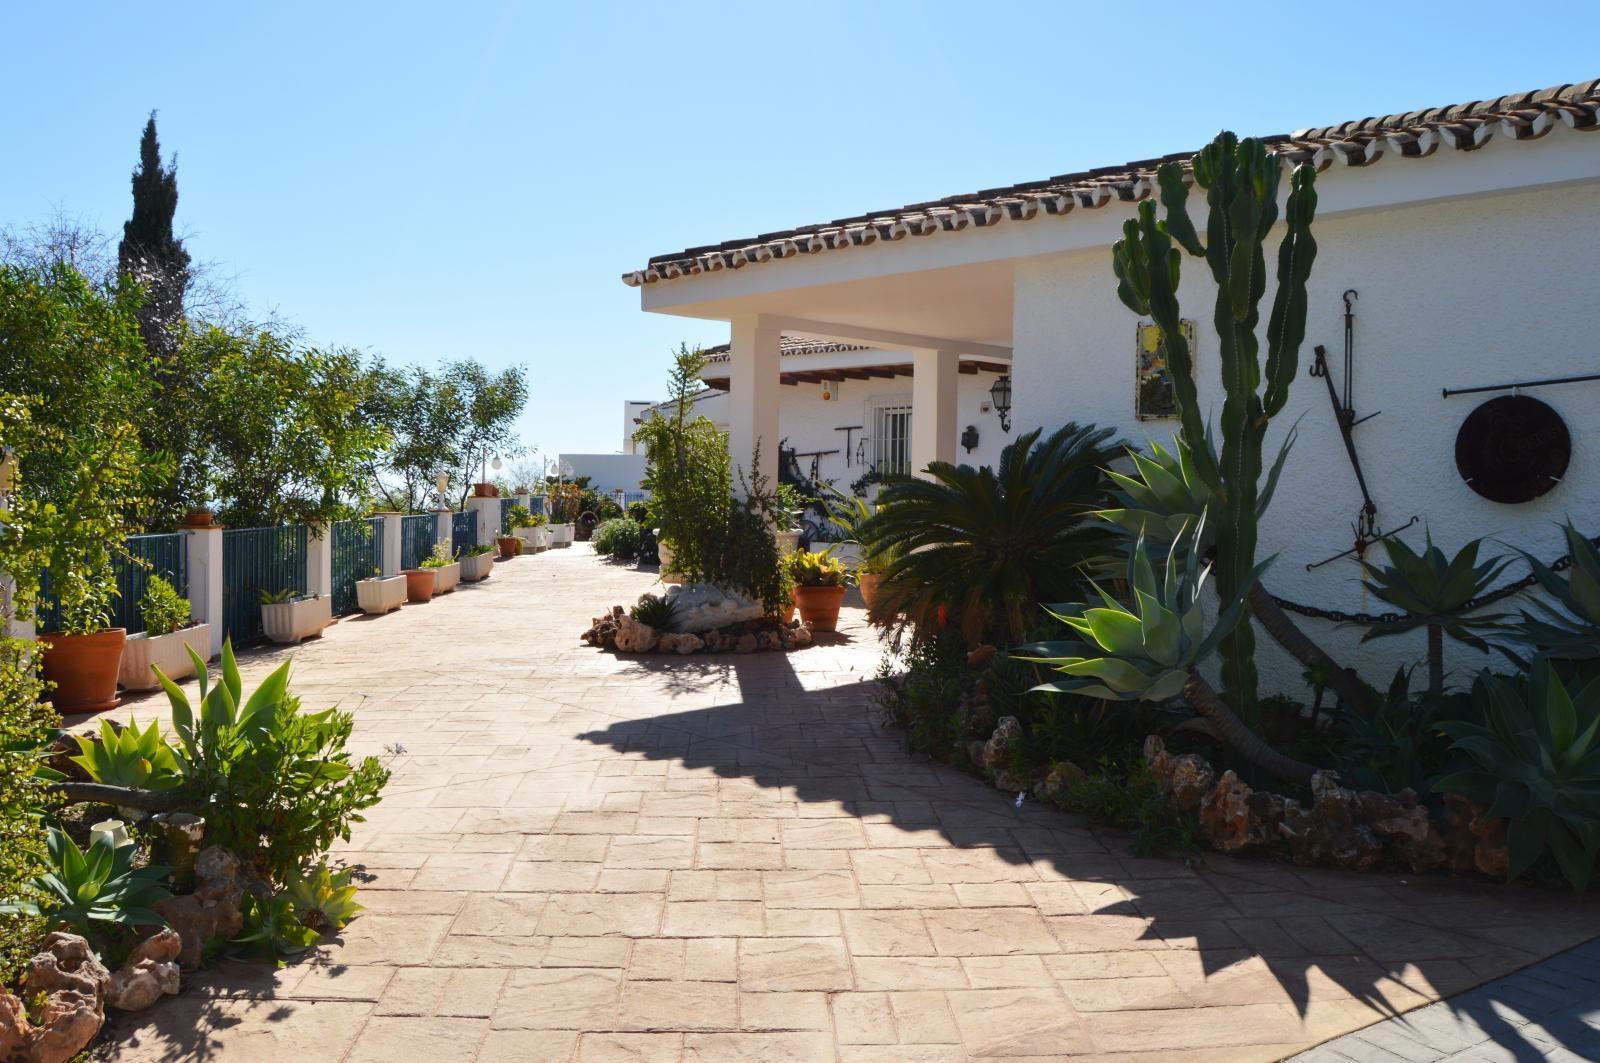 Chalet for sale in Cerrado de Calderon, Malaga